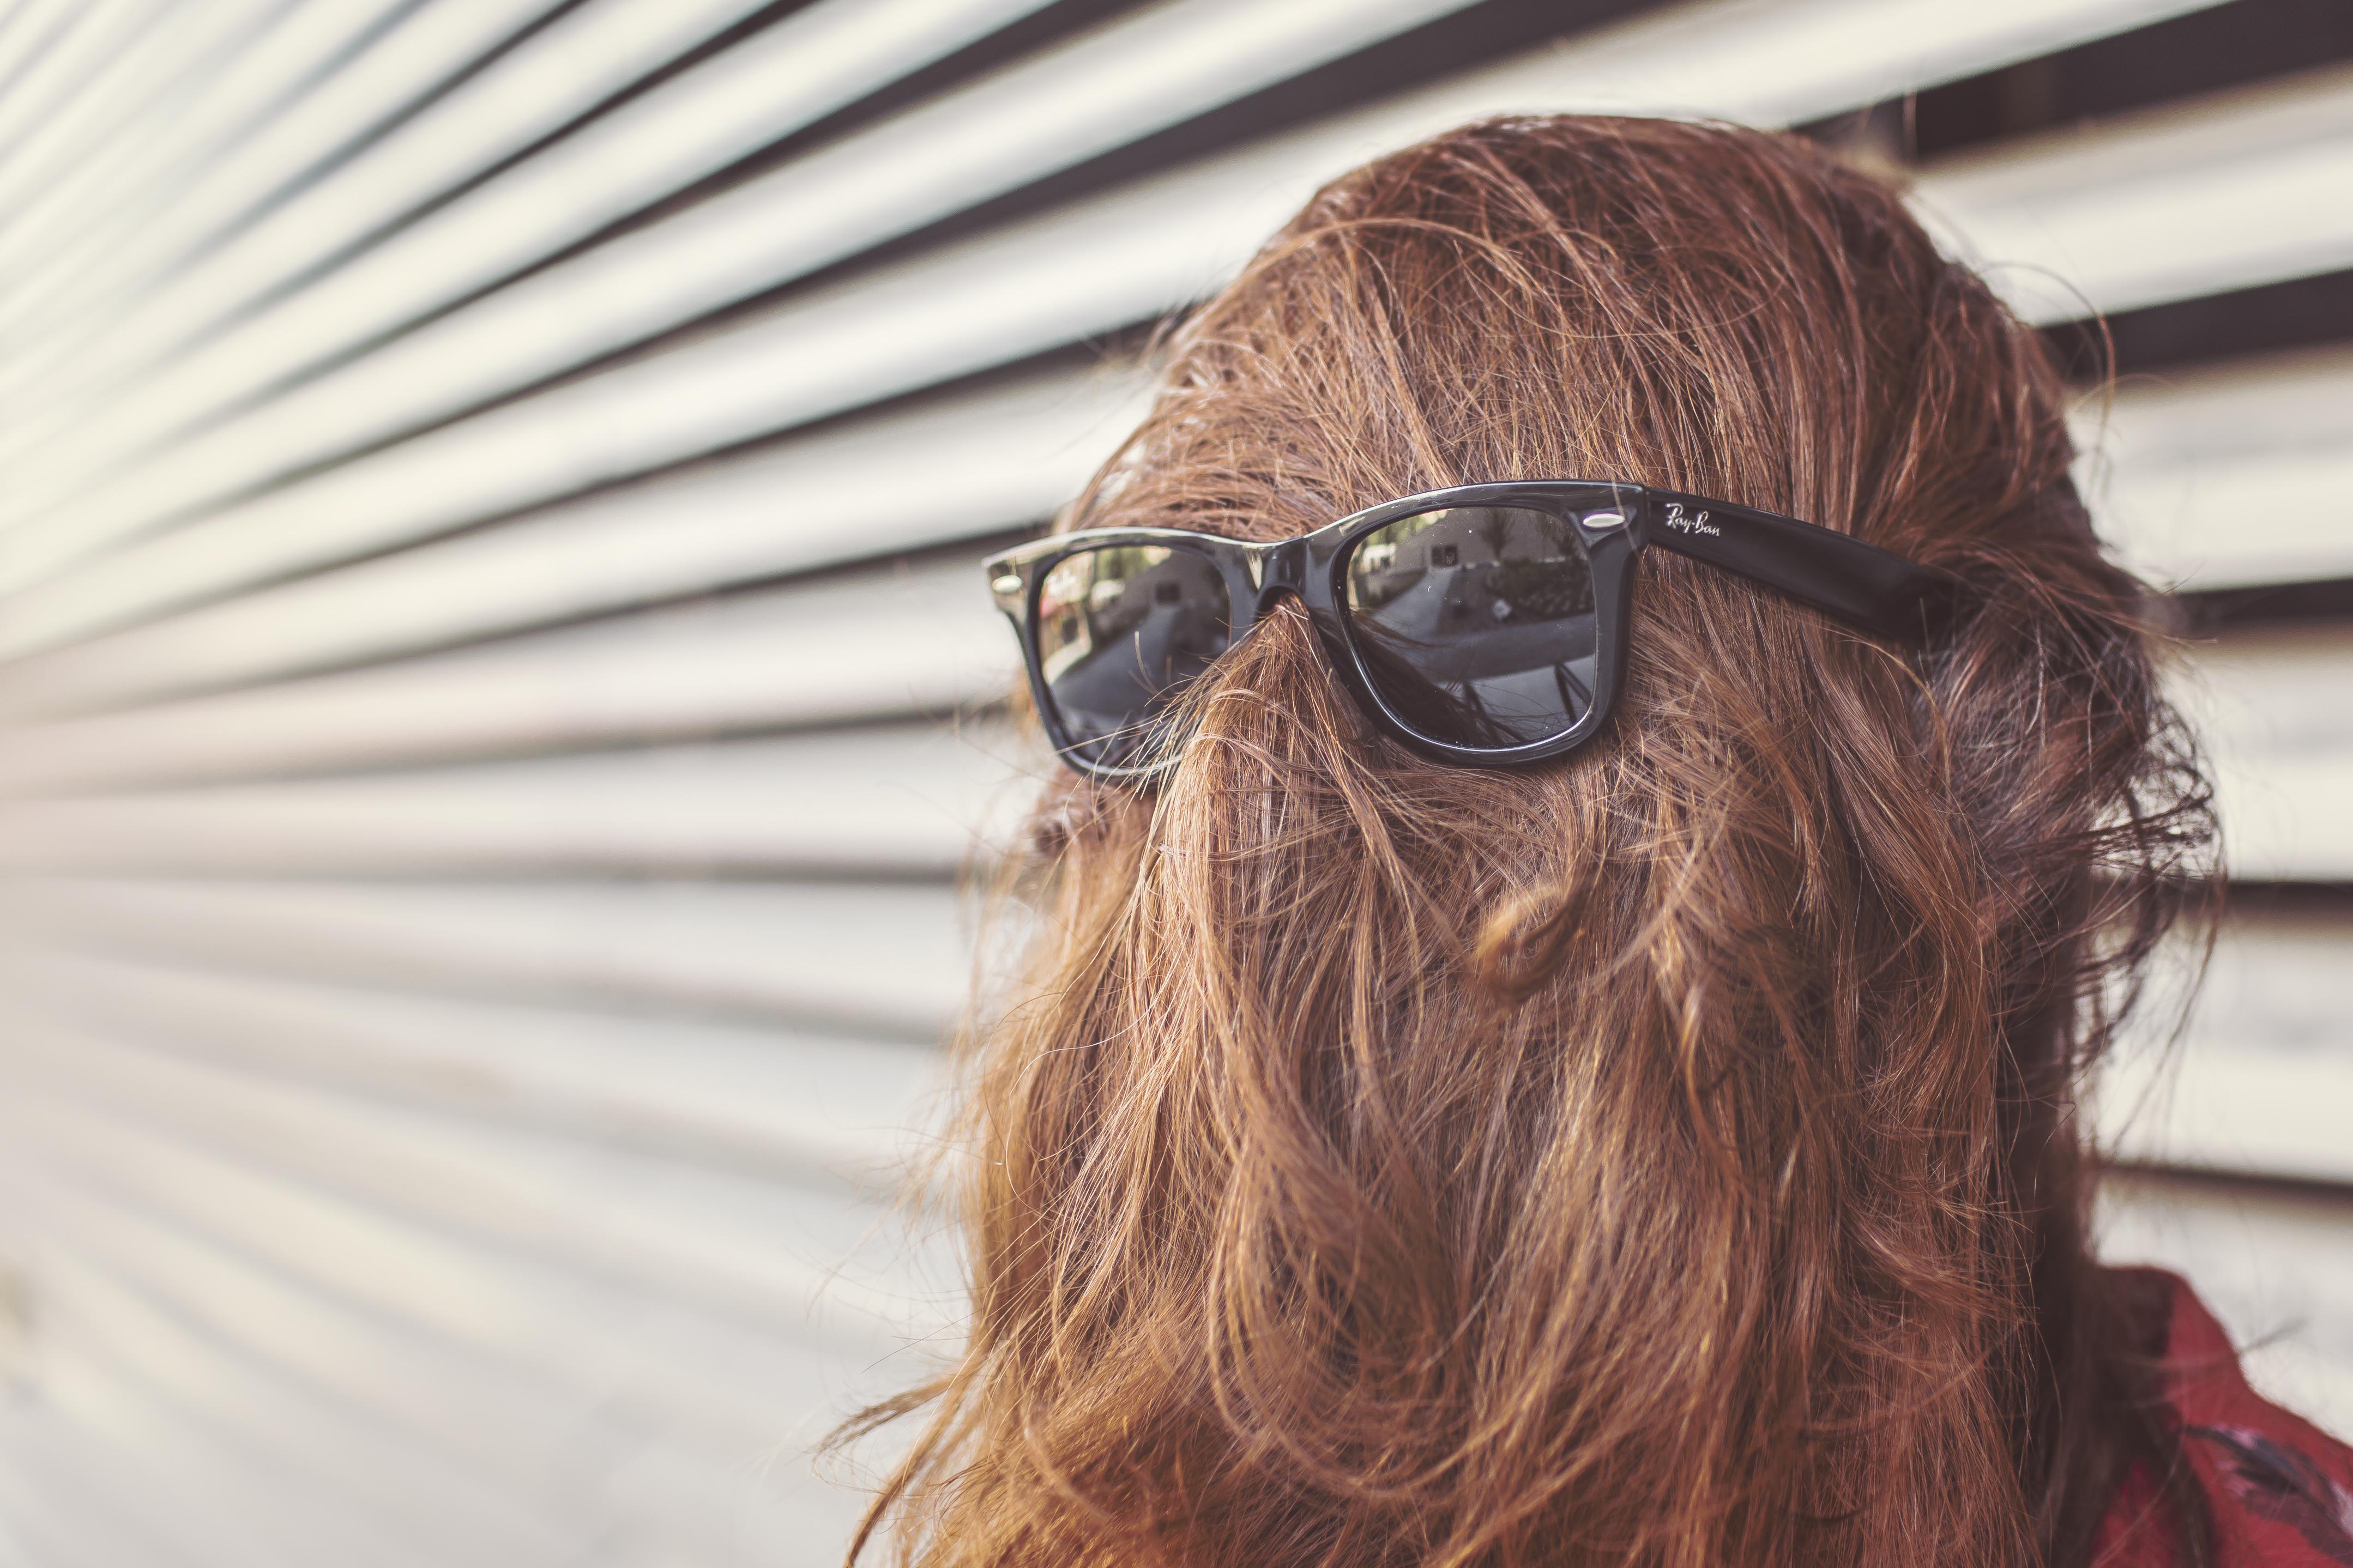 sunglasses-woman-girl-faceless.jpg (4316×2877)